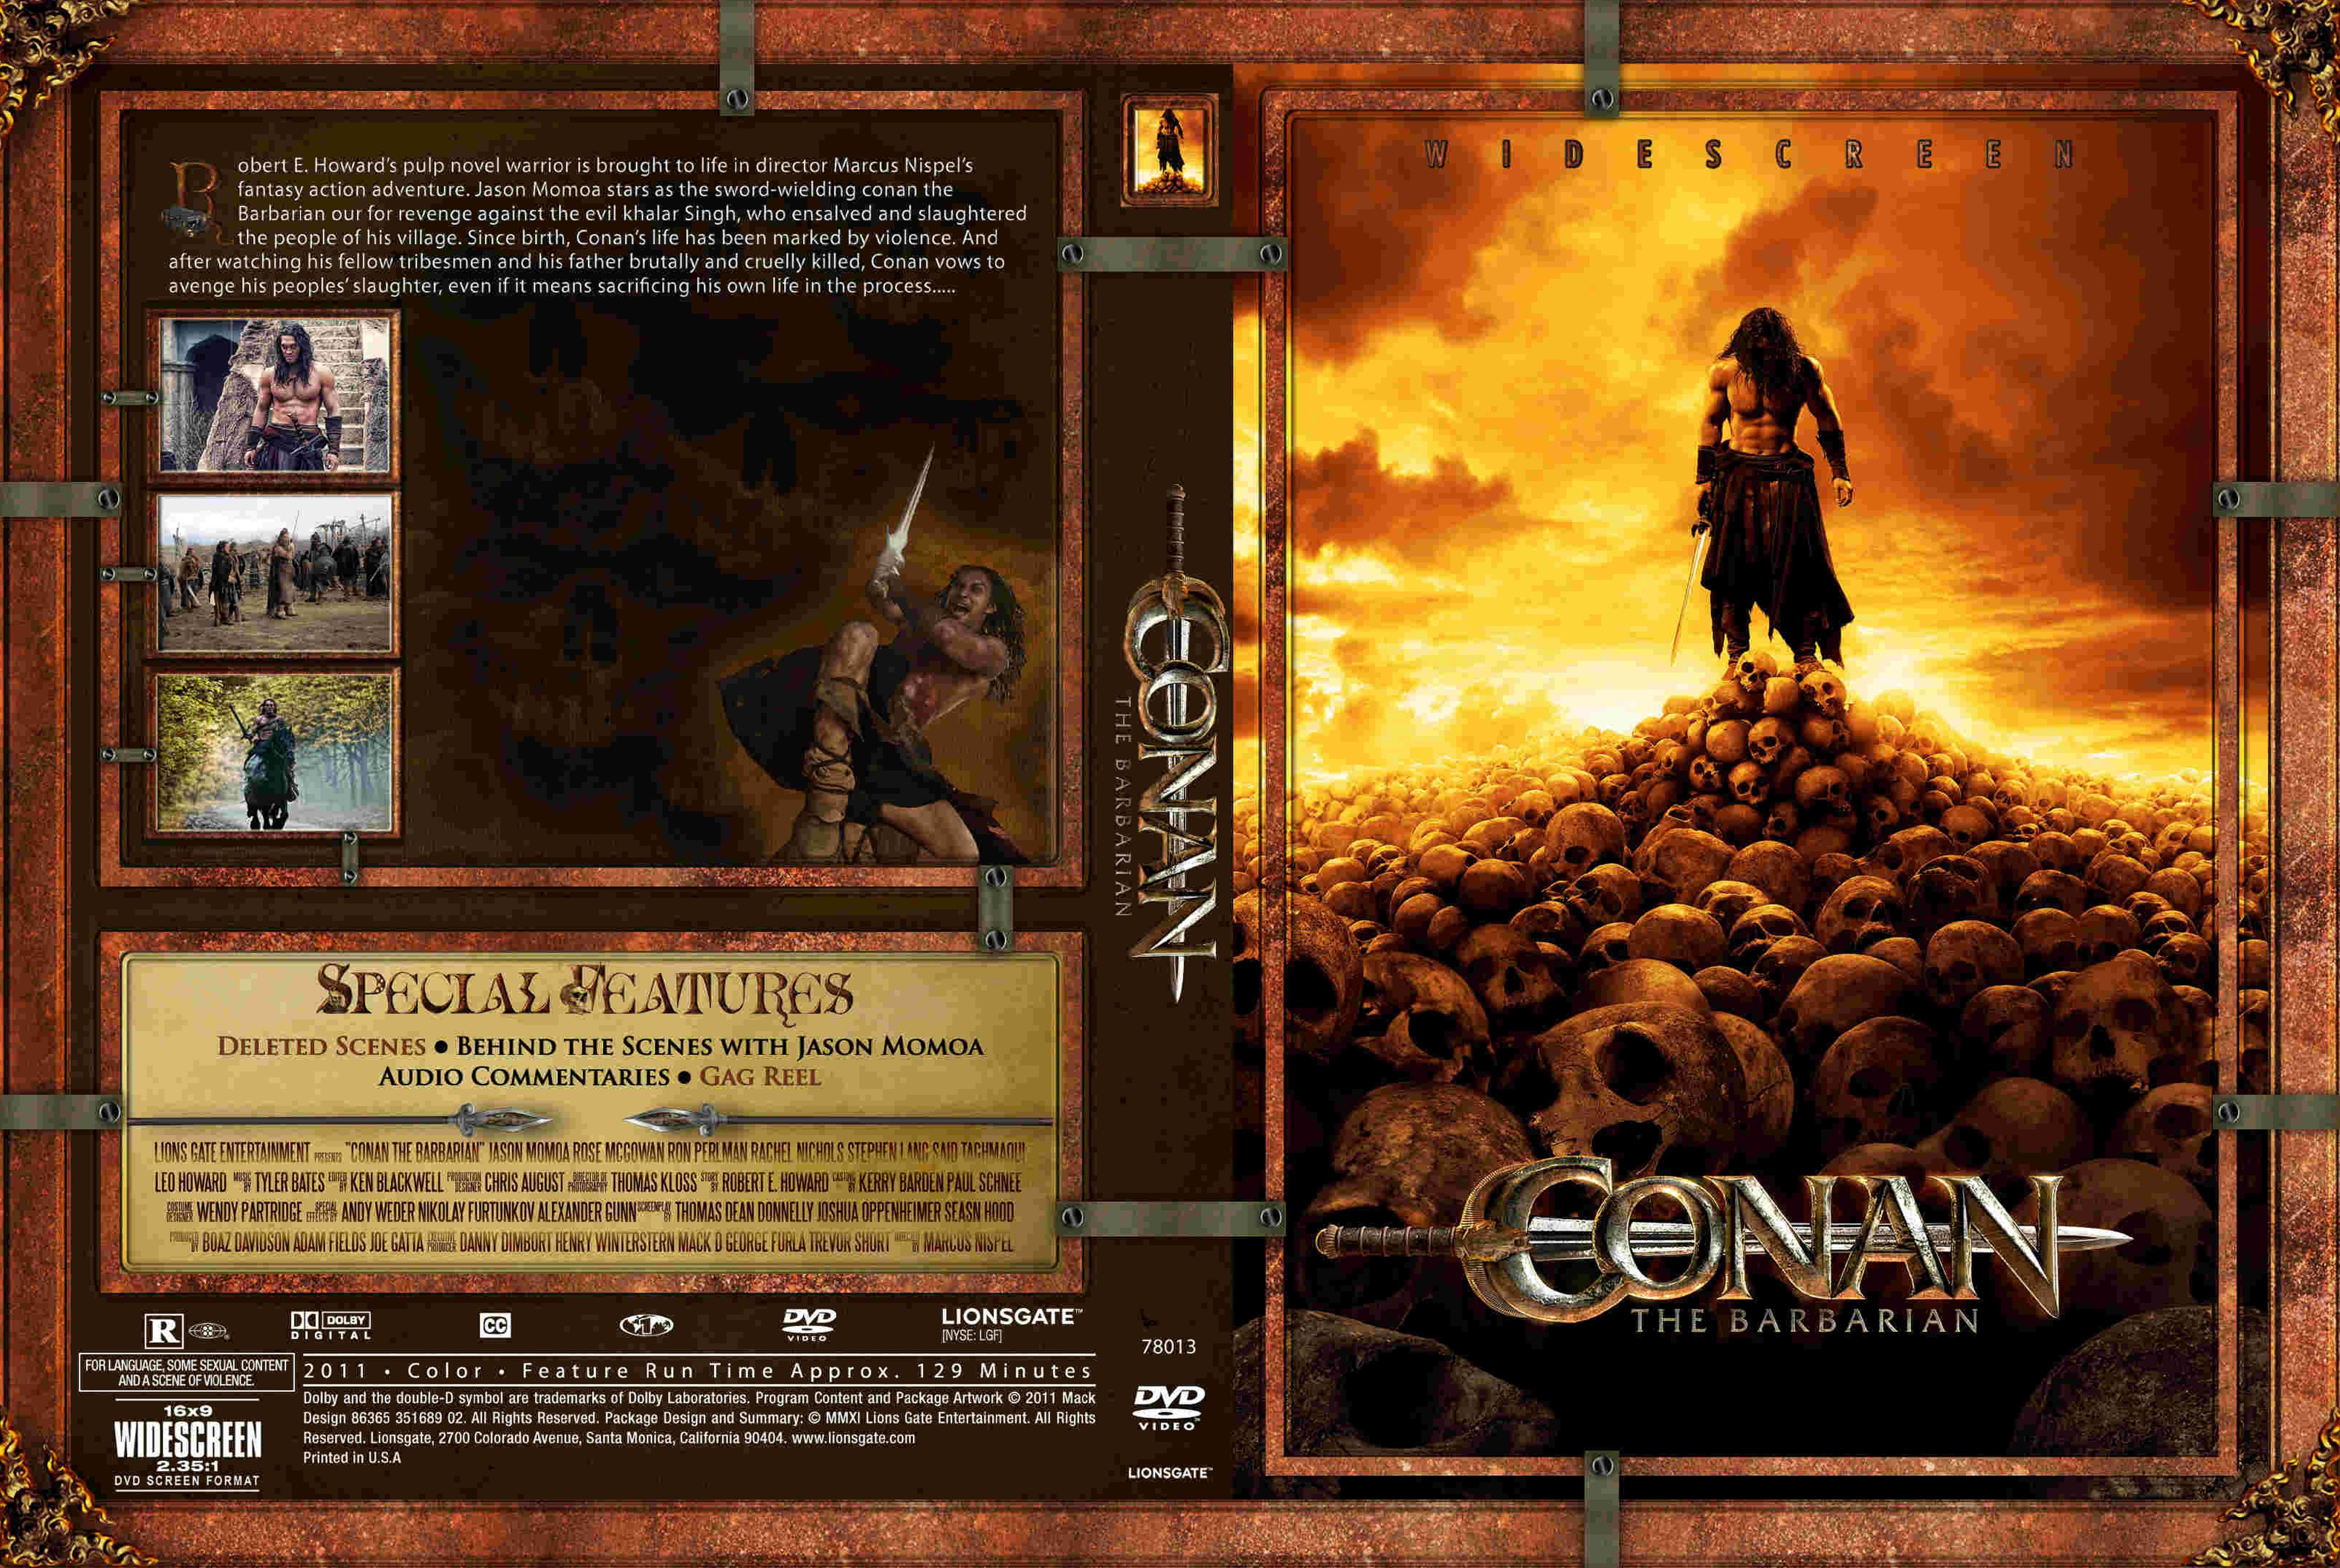 COVERS BOX SK ::: conan the barbarian (2011) - high quality